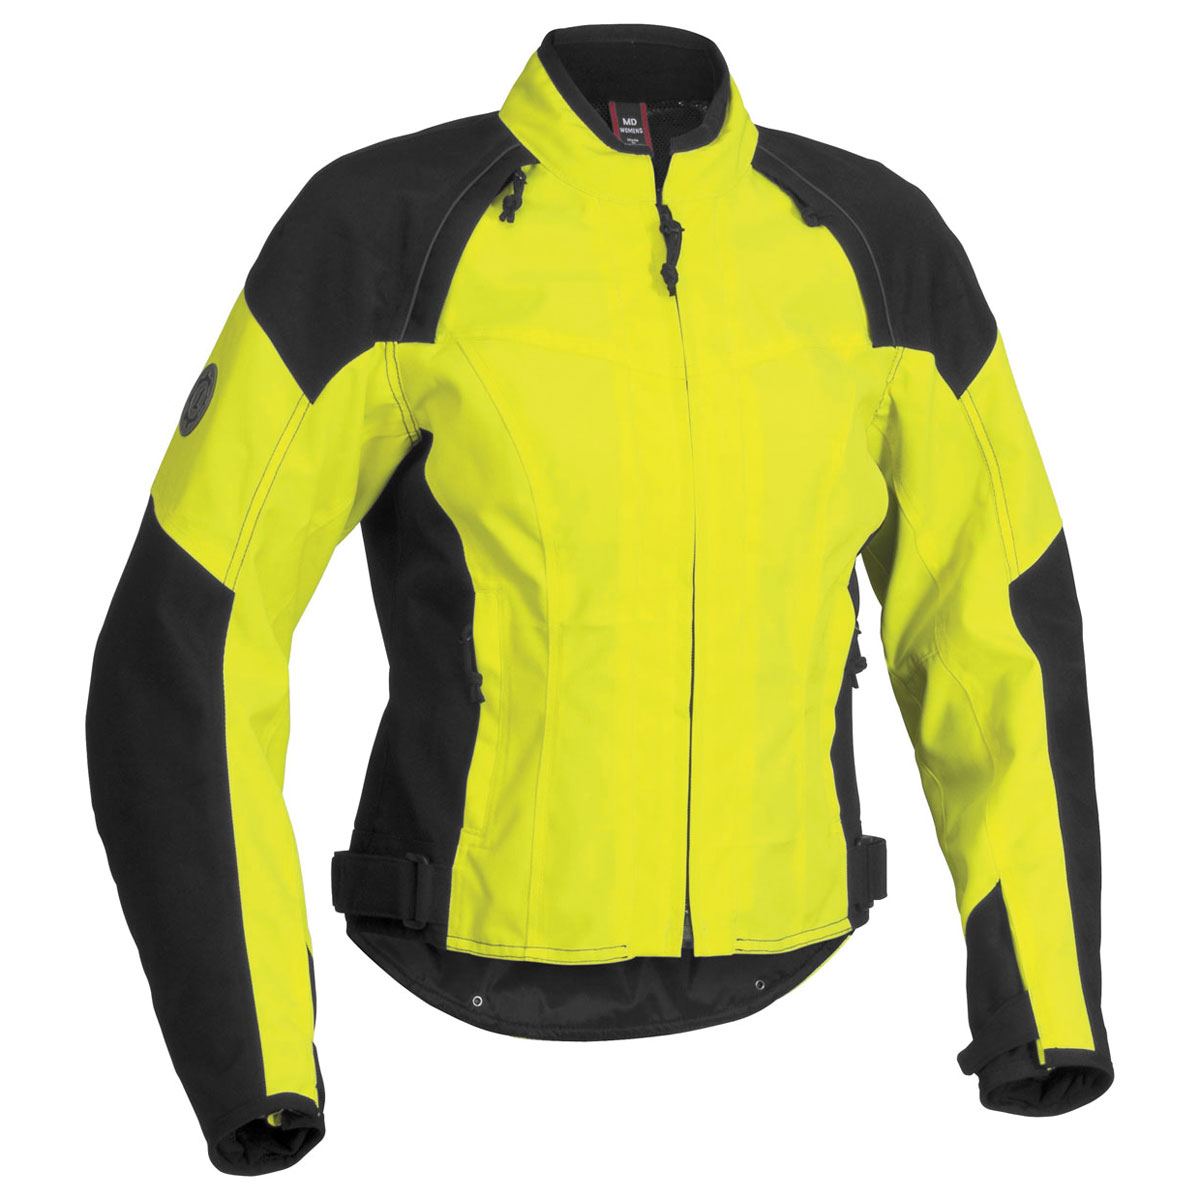 Firstgear Women's Contour DayGlo Textile Jacket